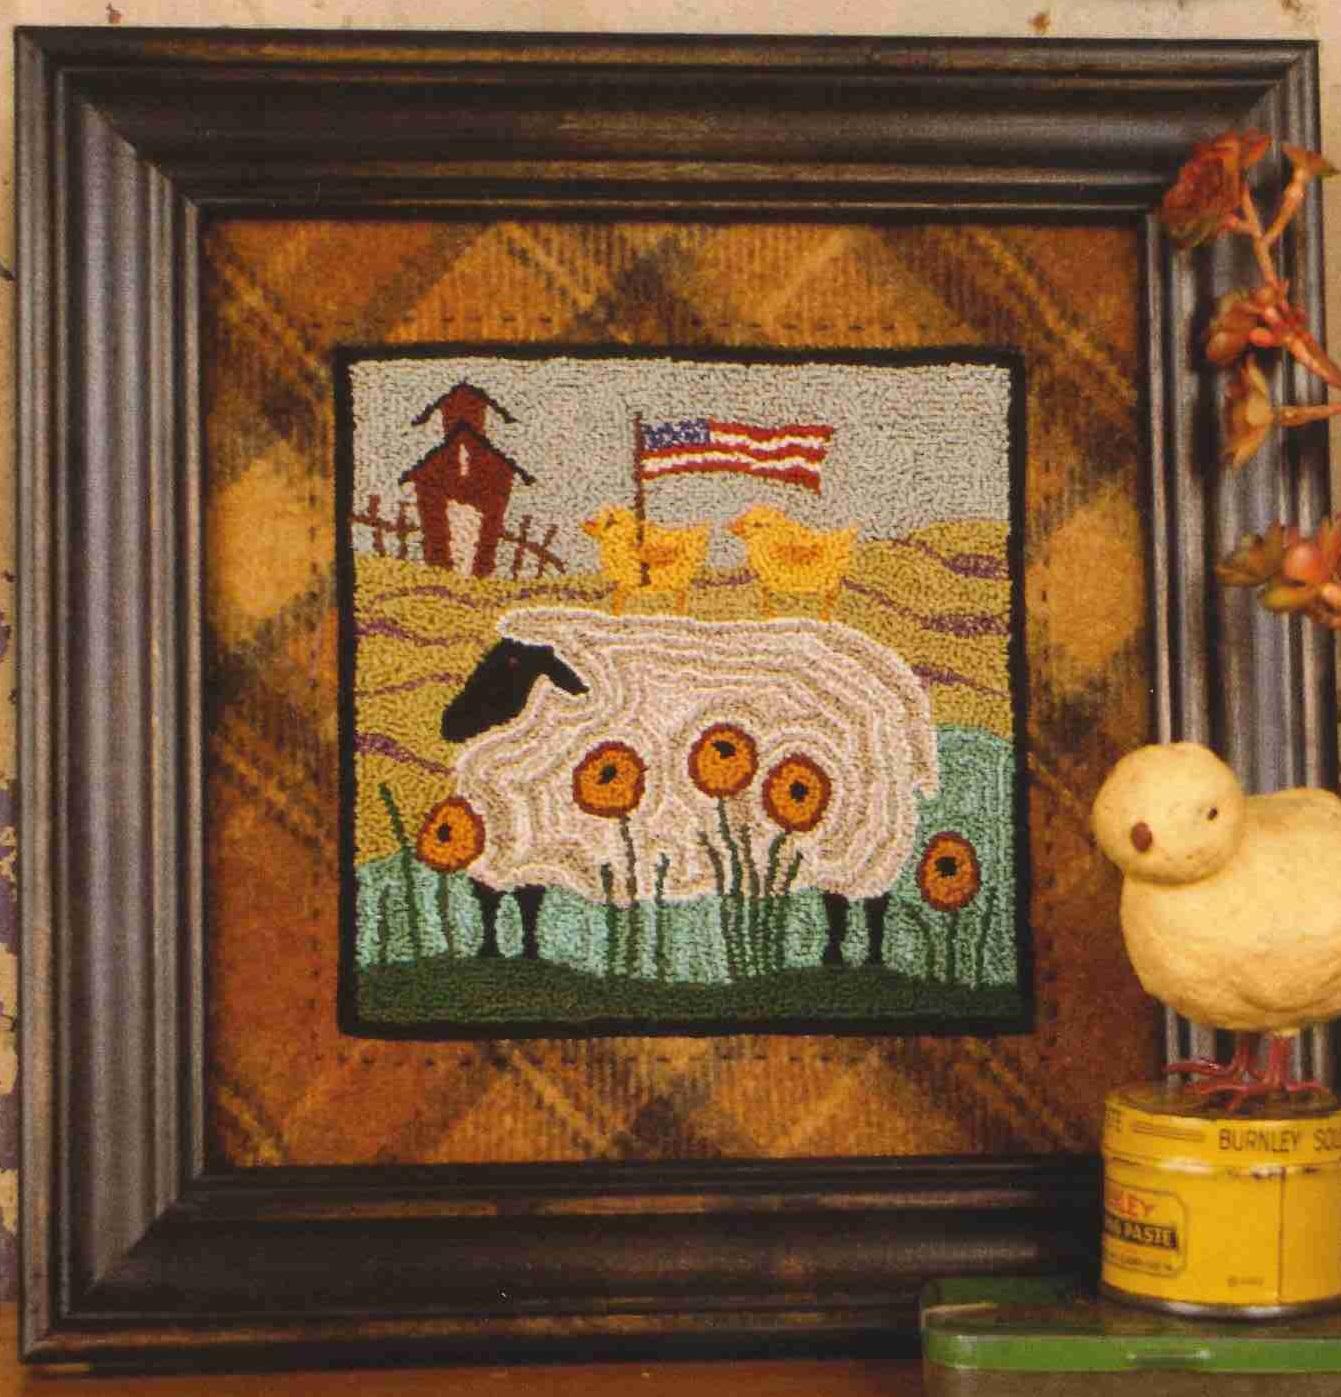 Garden Tour 681 Punch Needle Pattern Threads That Bind Sheep Punchneedle